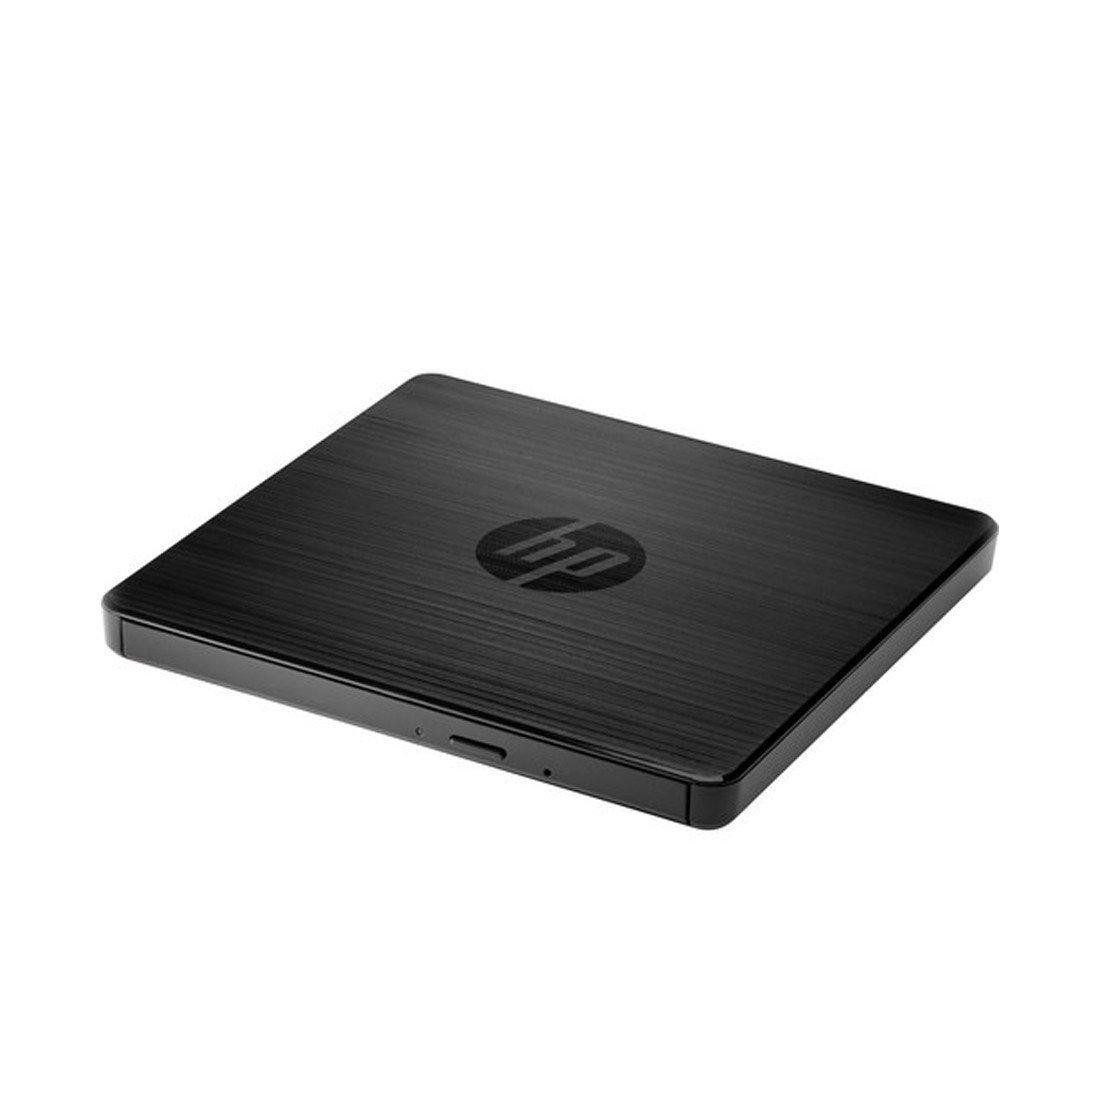 HP F6V97AA#ACJ External USB DVD-RW Drive product image